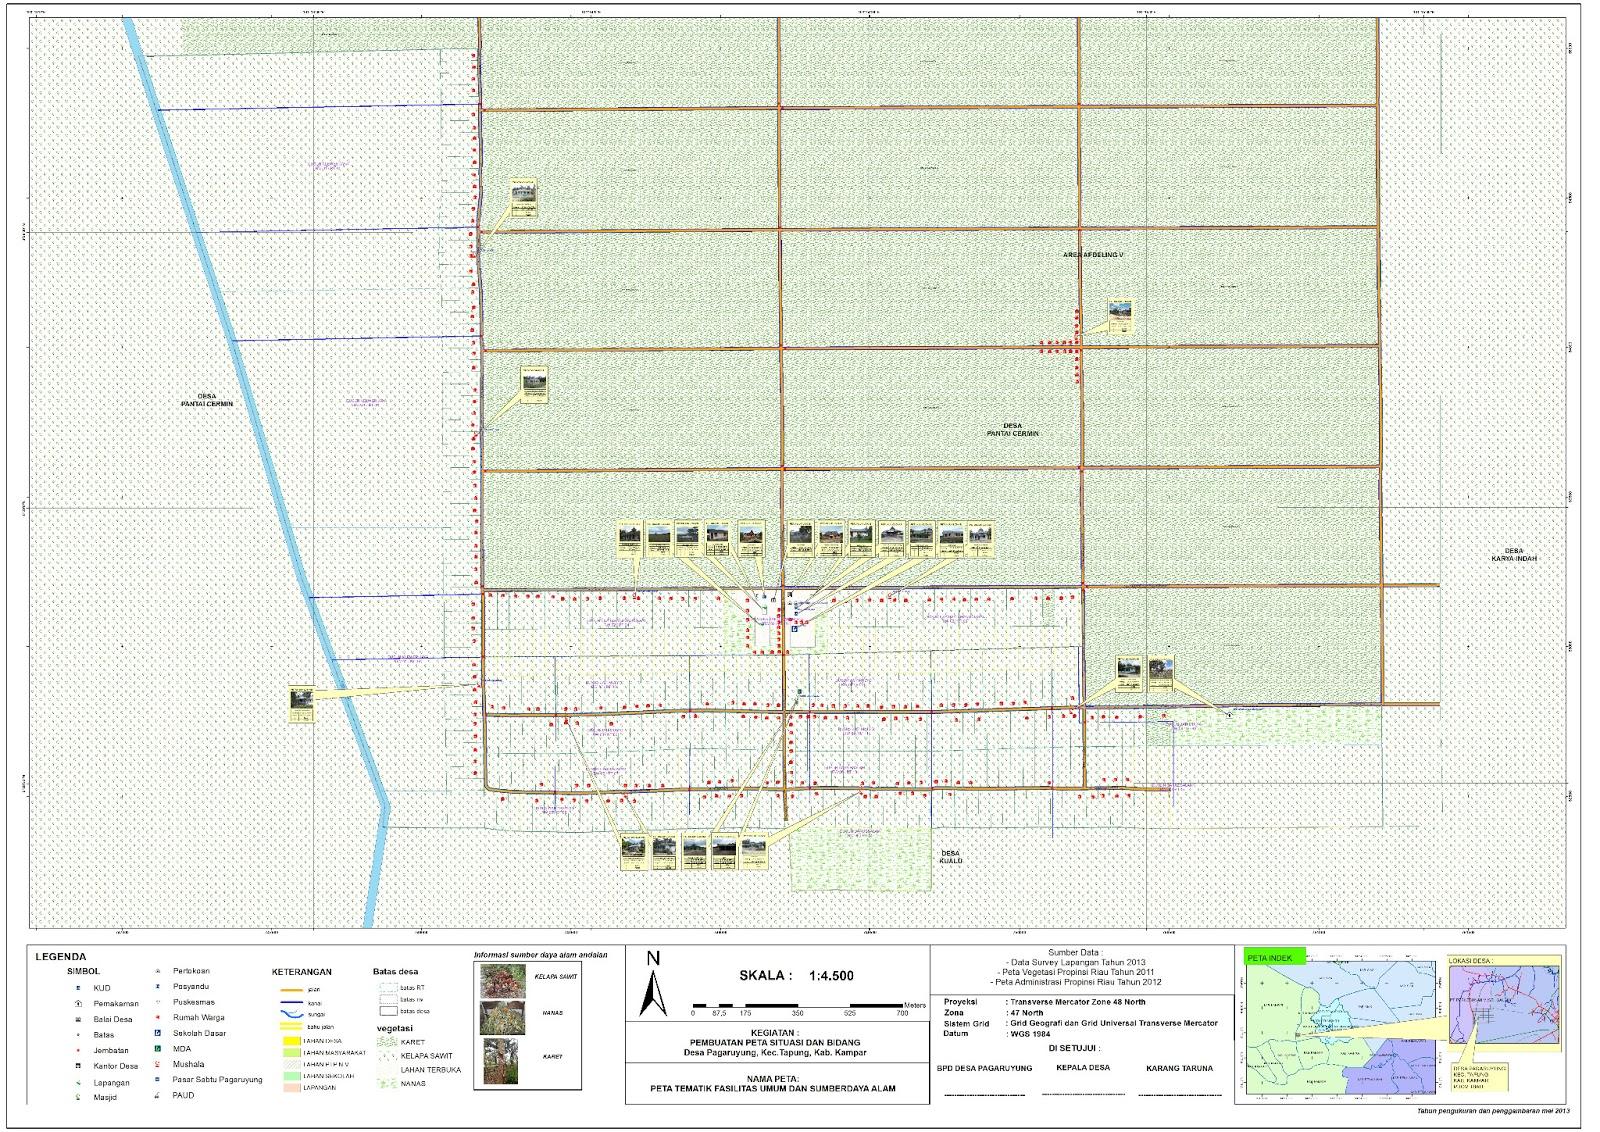 Yudi's_putrakarya_blog: Peta Desa Pagaruyung, tapung ...